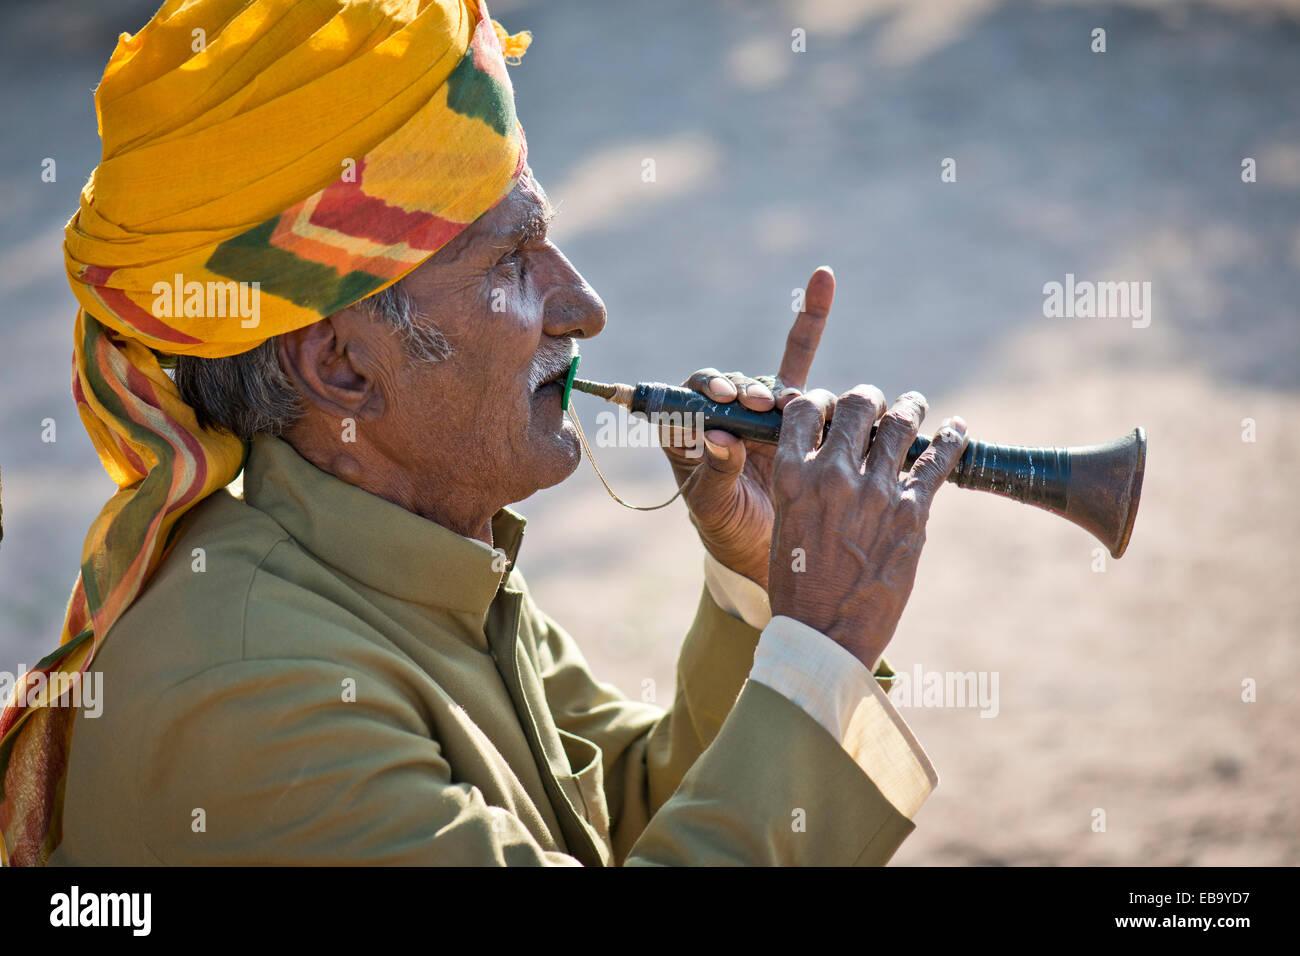 Flute player wearing a yellow turban, Mehrangarh Fort, Jodhpur, Rajasthan, India - Stock Image